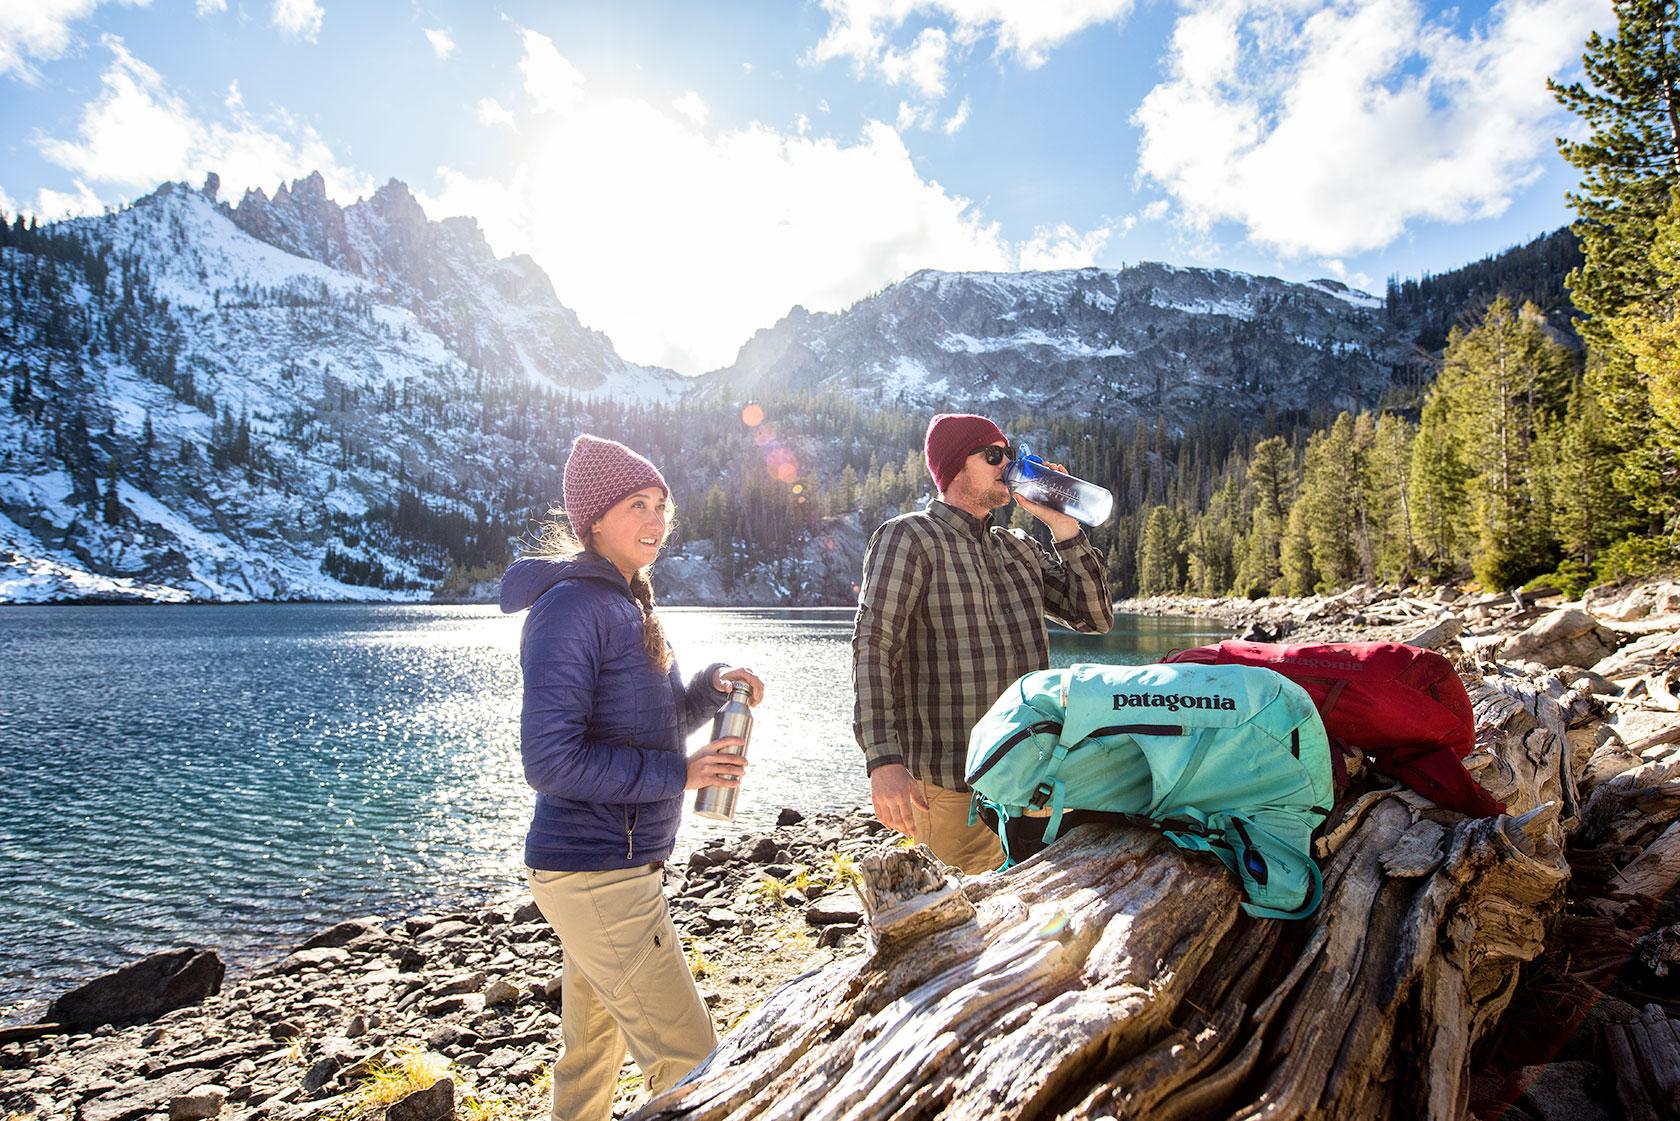 austin-trigg-patagonia-sawtooth-hiking-sunset-bench-lake-peak-advenure-wilderness-forest-idaho-outside-lifestyle-day-fall-weather-mountains-sun-flare.jpg